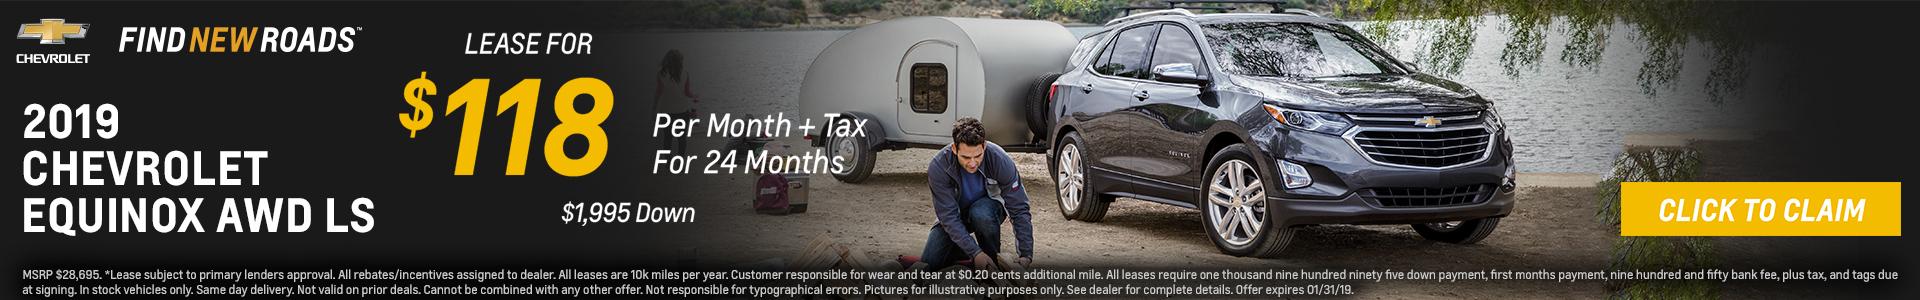 Chevrolet Equinox $118 Lease